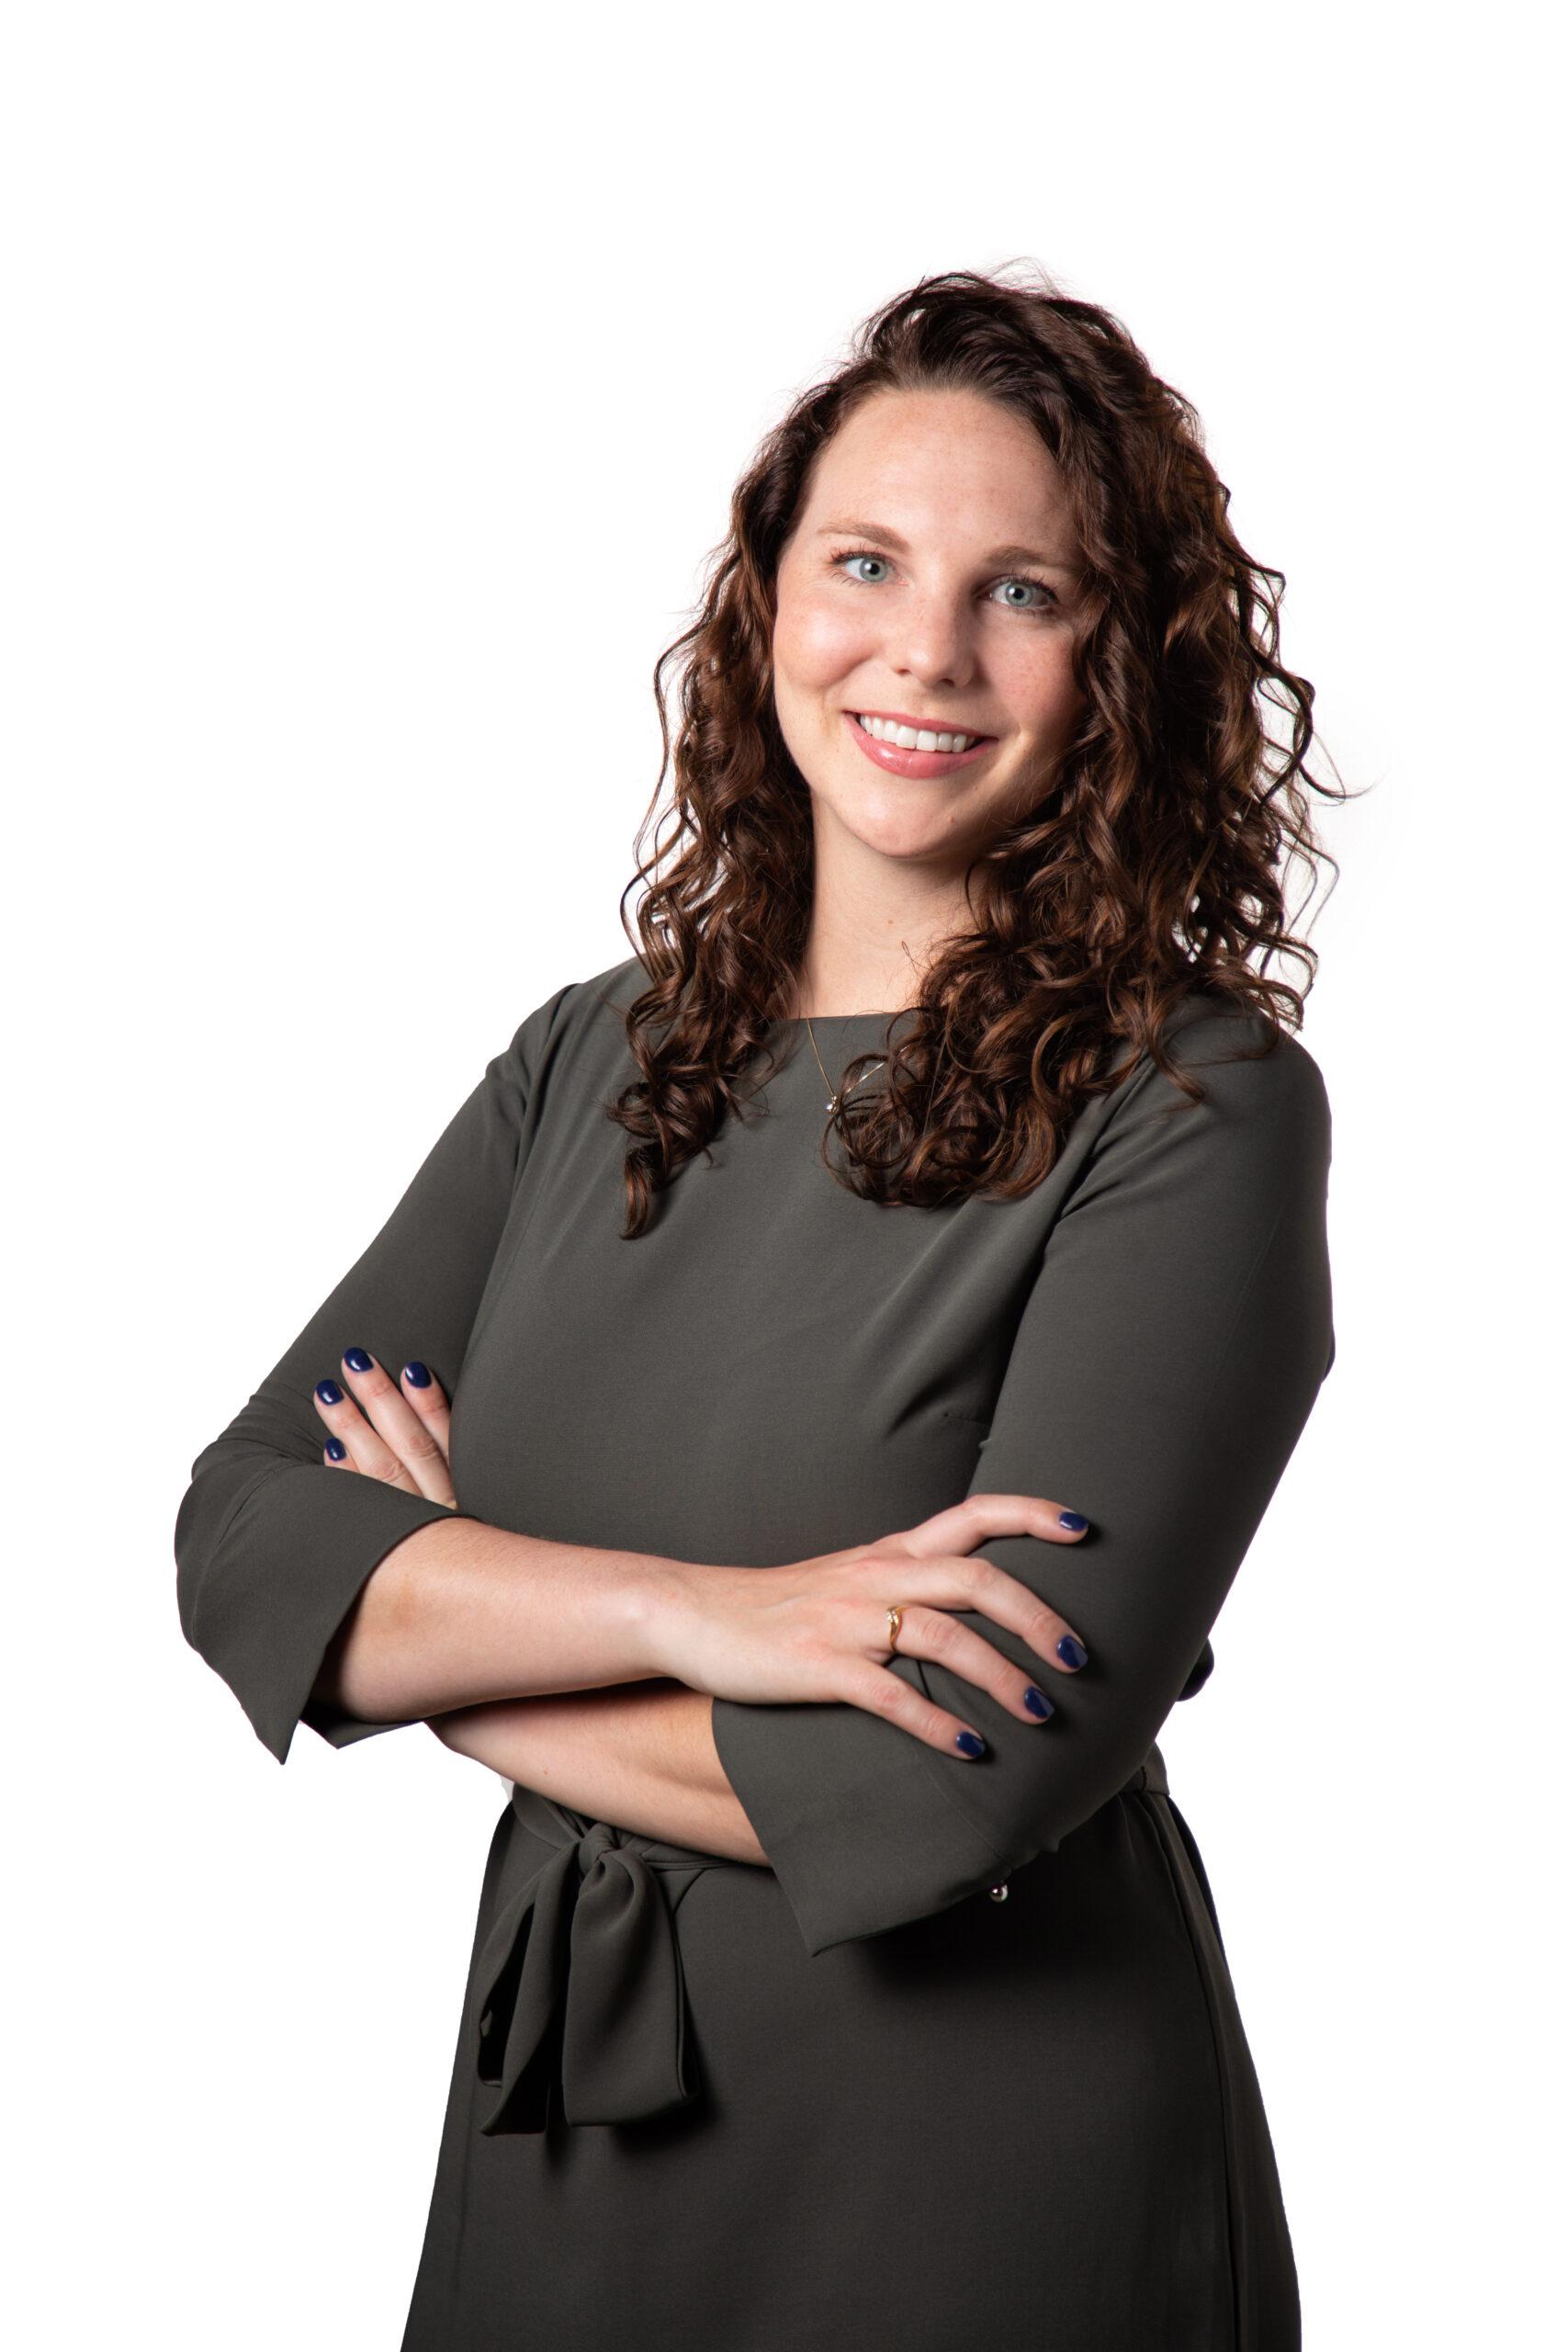 Mandy Prather